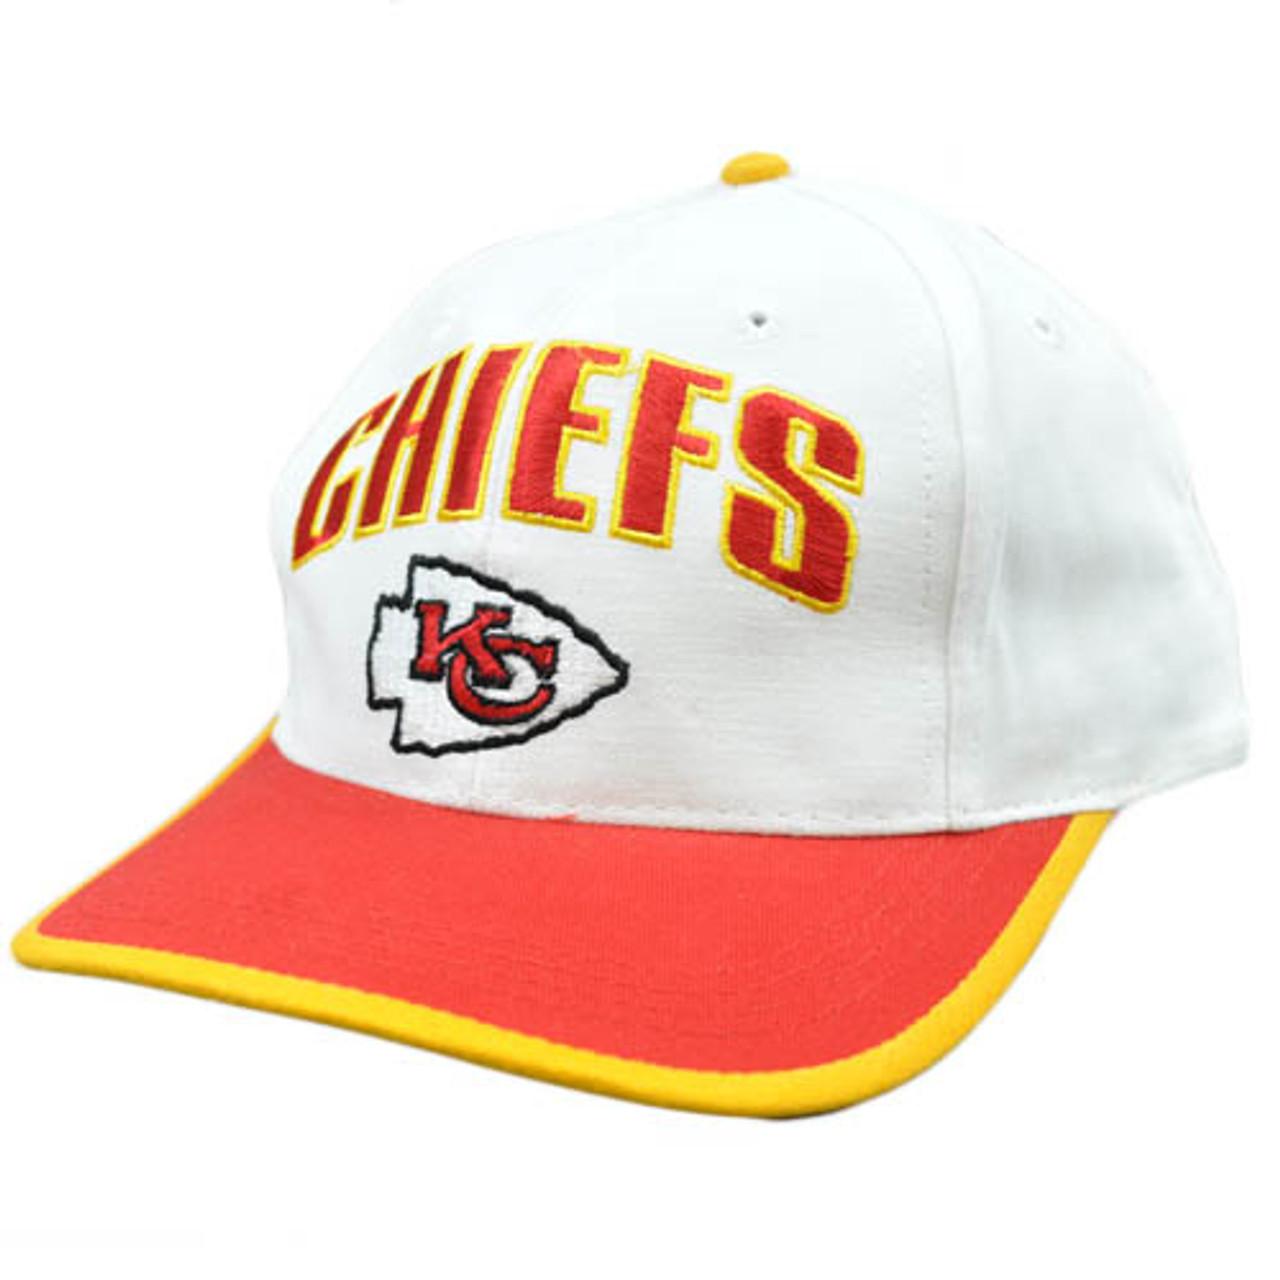 2e046a65411f9c NFL Kansas City Chiefs White Red Yellow Vintage Retro Flat Bill Snapback  Hat Cap - Cap Store Online.com